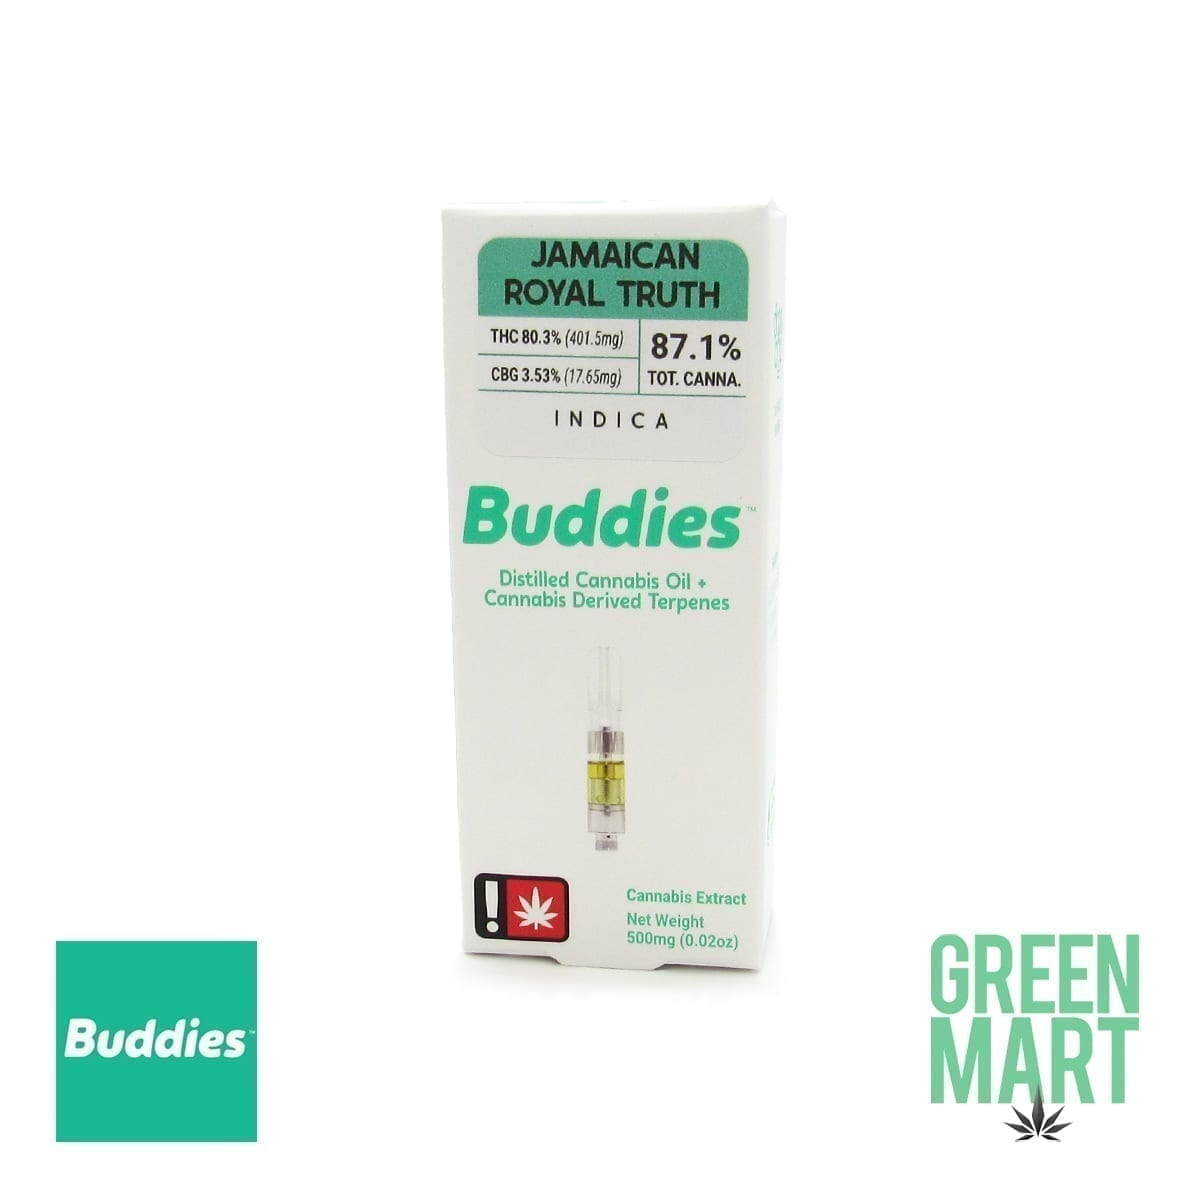 Buddies Brand Distillate Cartridge - Jamaican Royal Truth